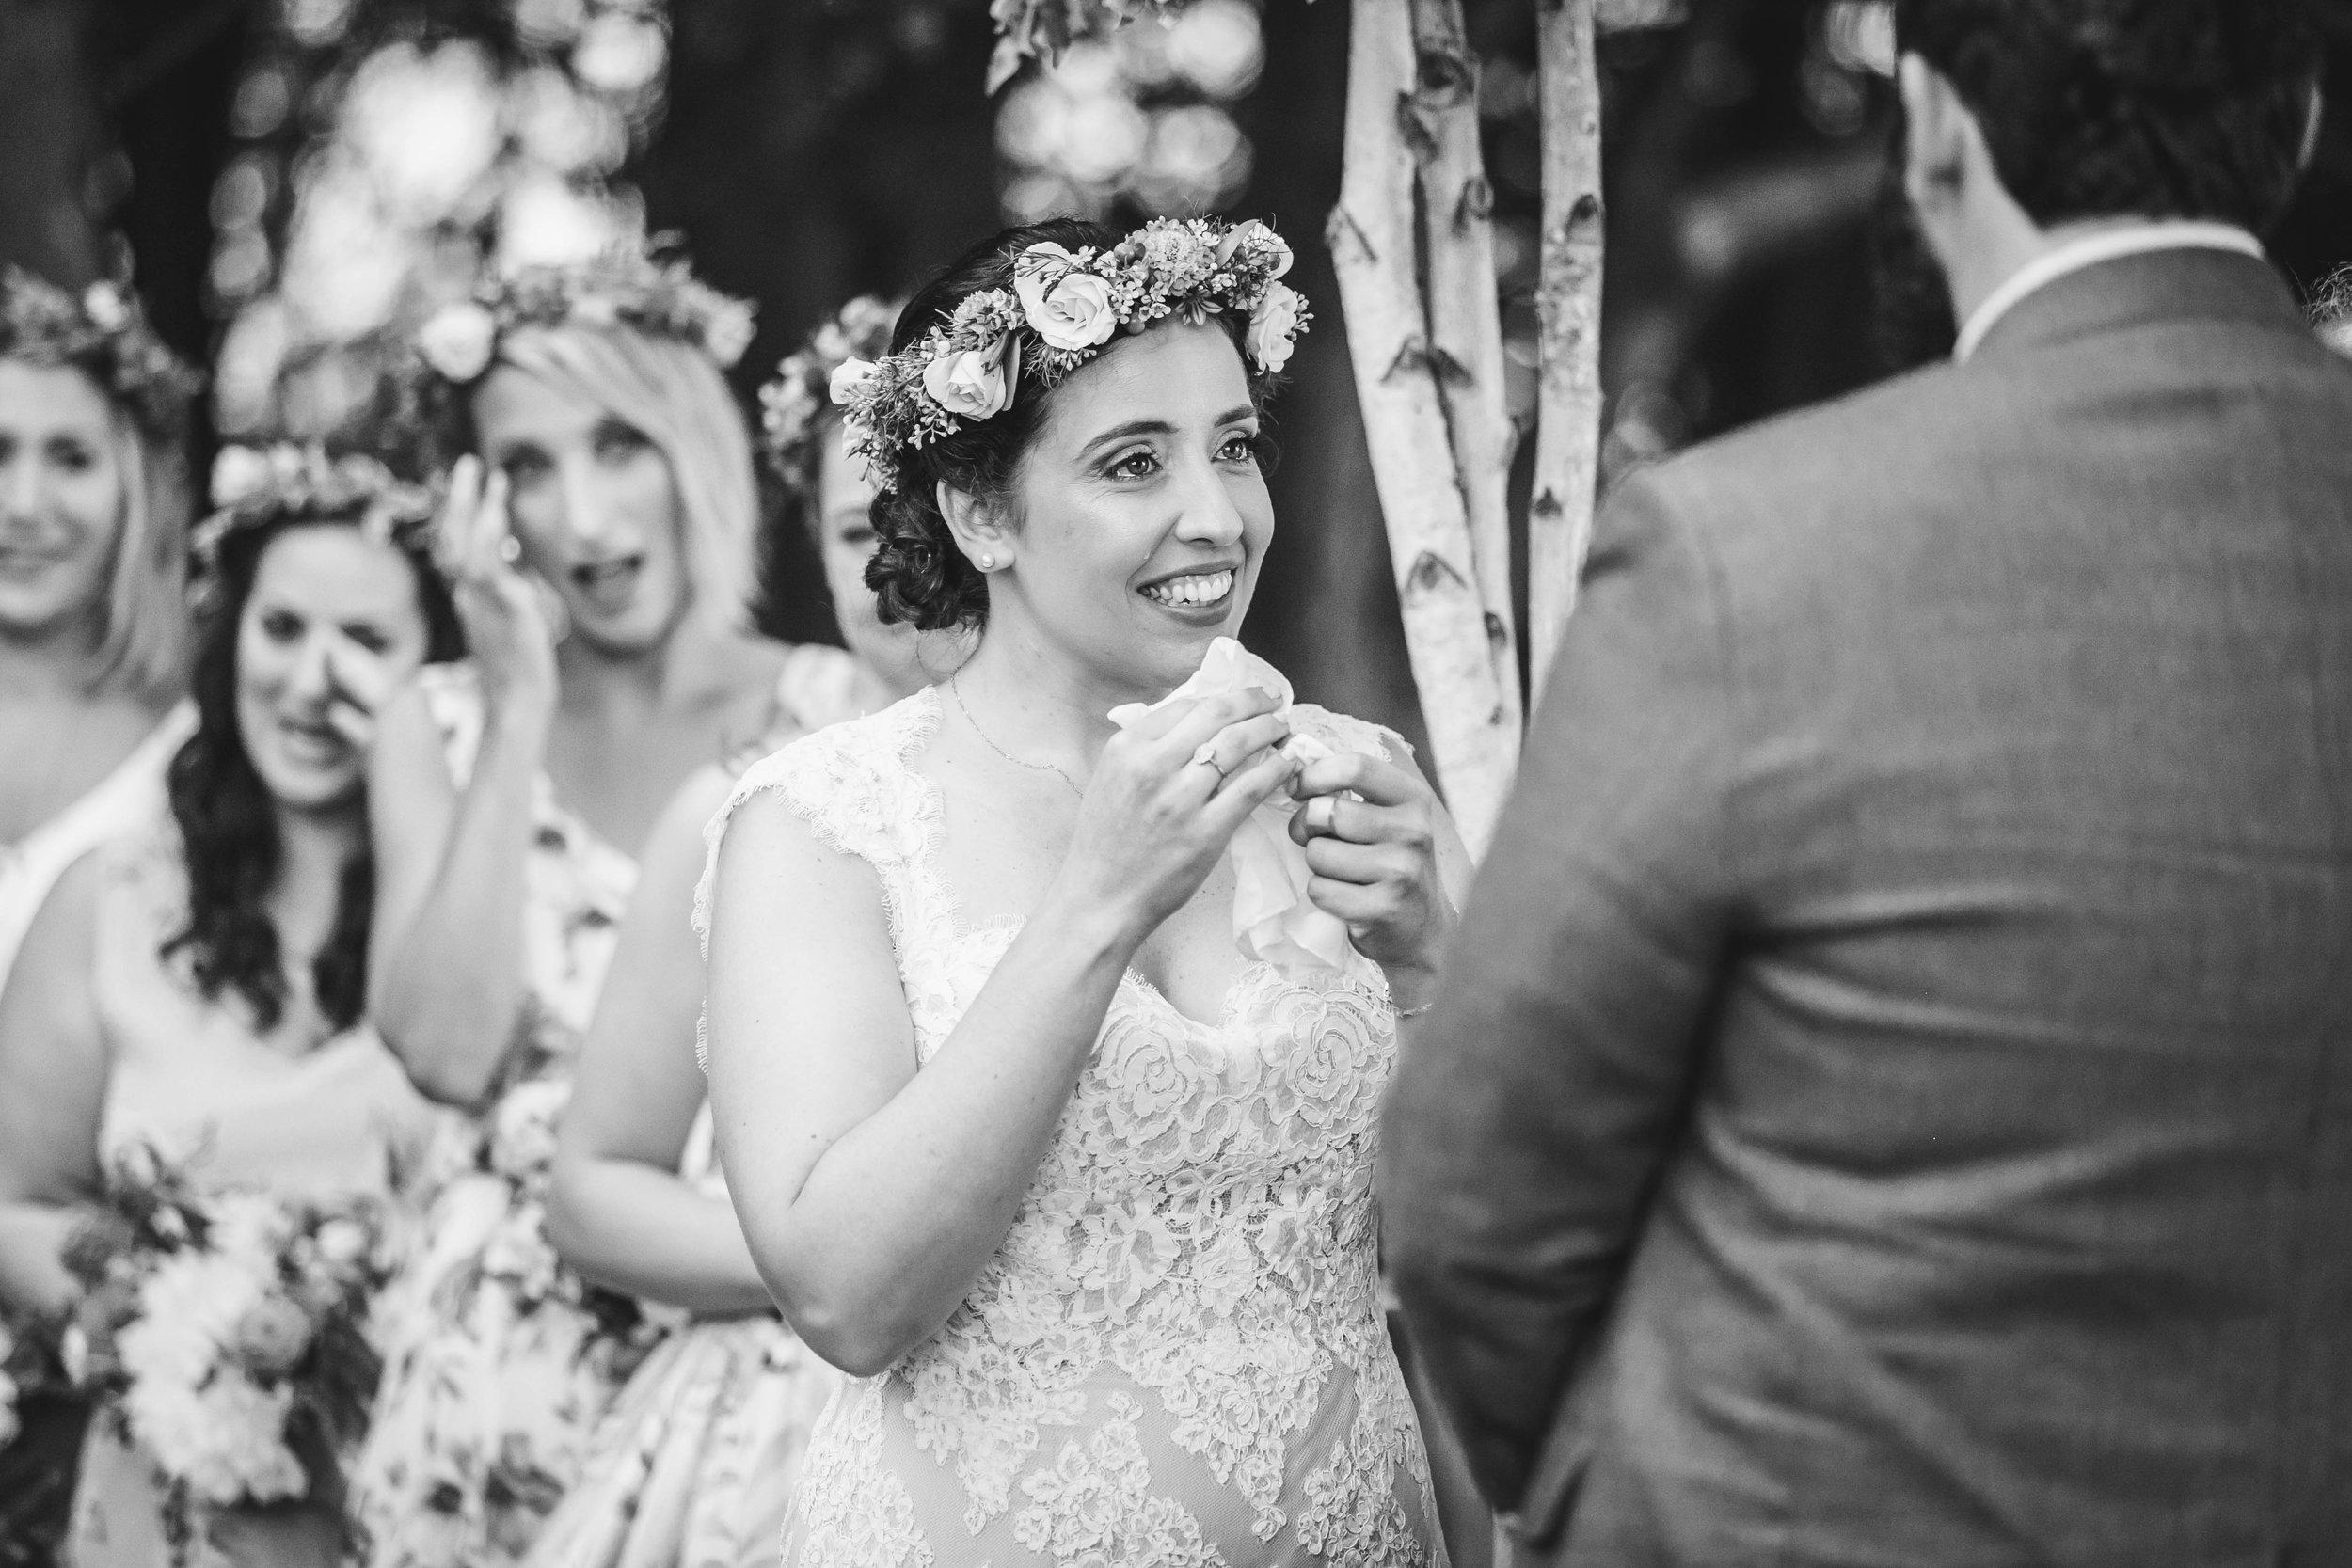 Mount Hope Farm Bristol Rhode Island RI New England Coastal Flower Crown Wedding - Emily Tebbetts Photography-10.jpg